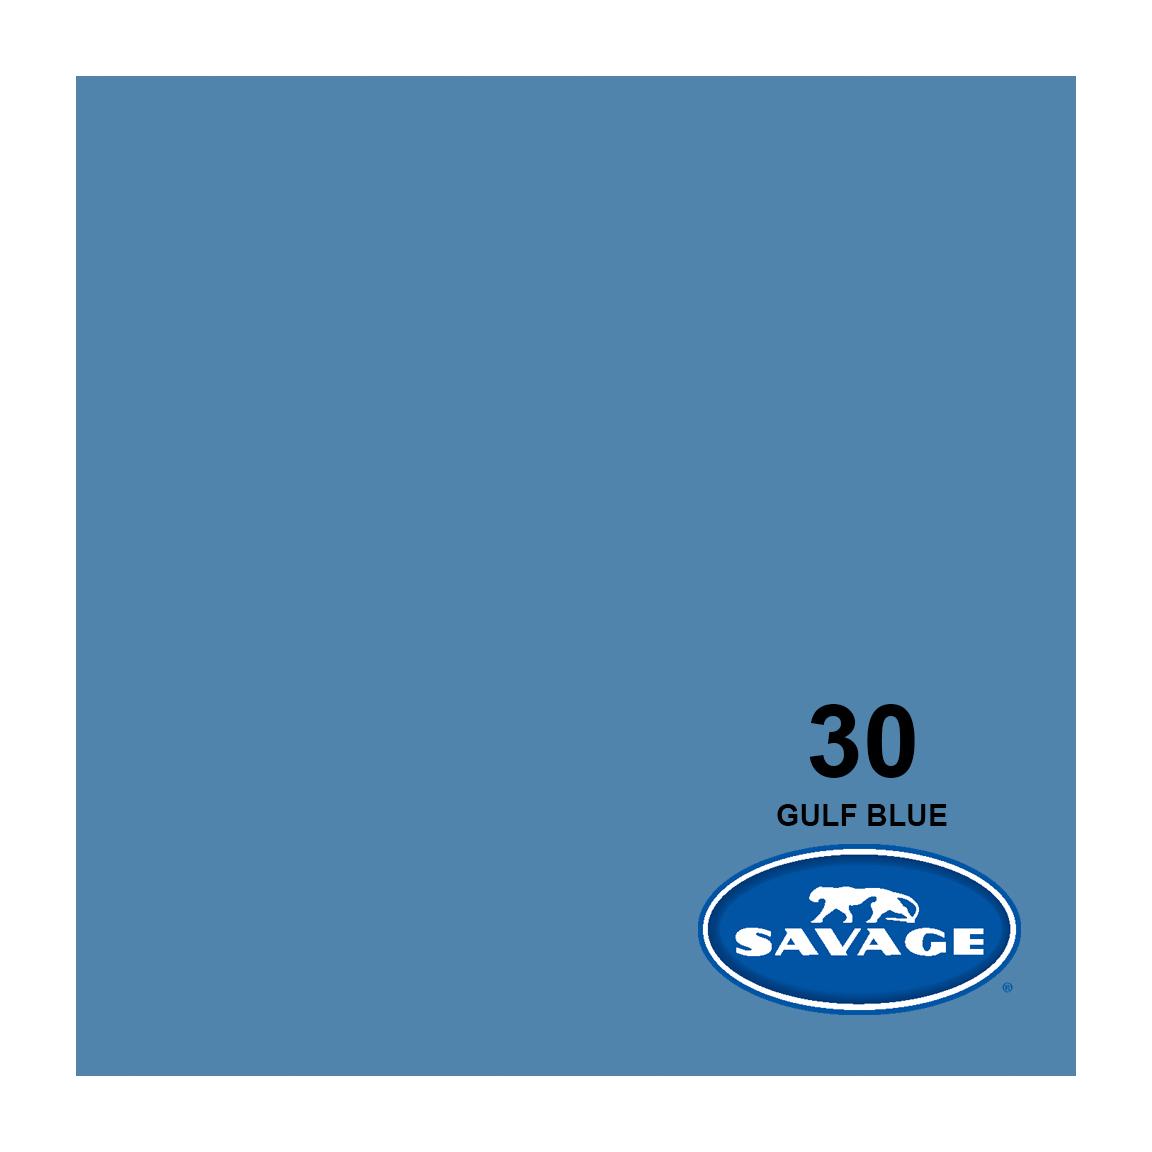 Henrys com : Paper Backgrounds - Backgrounds - Lighting